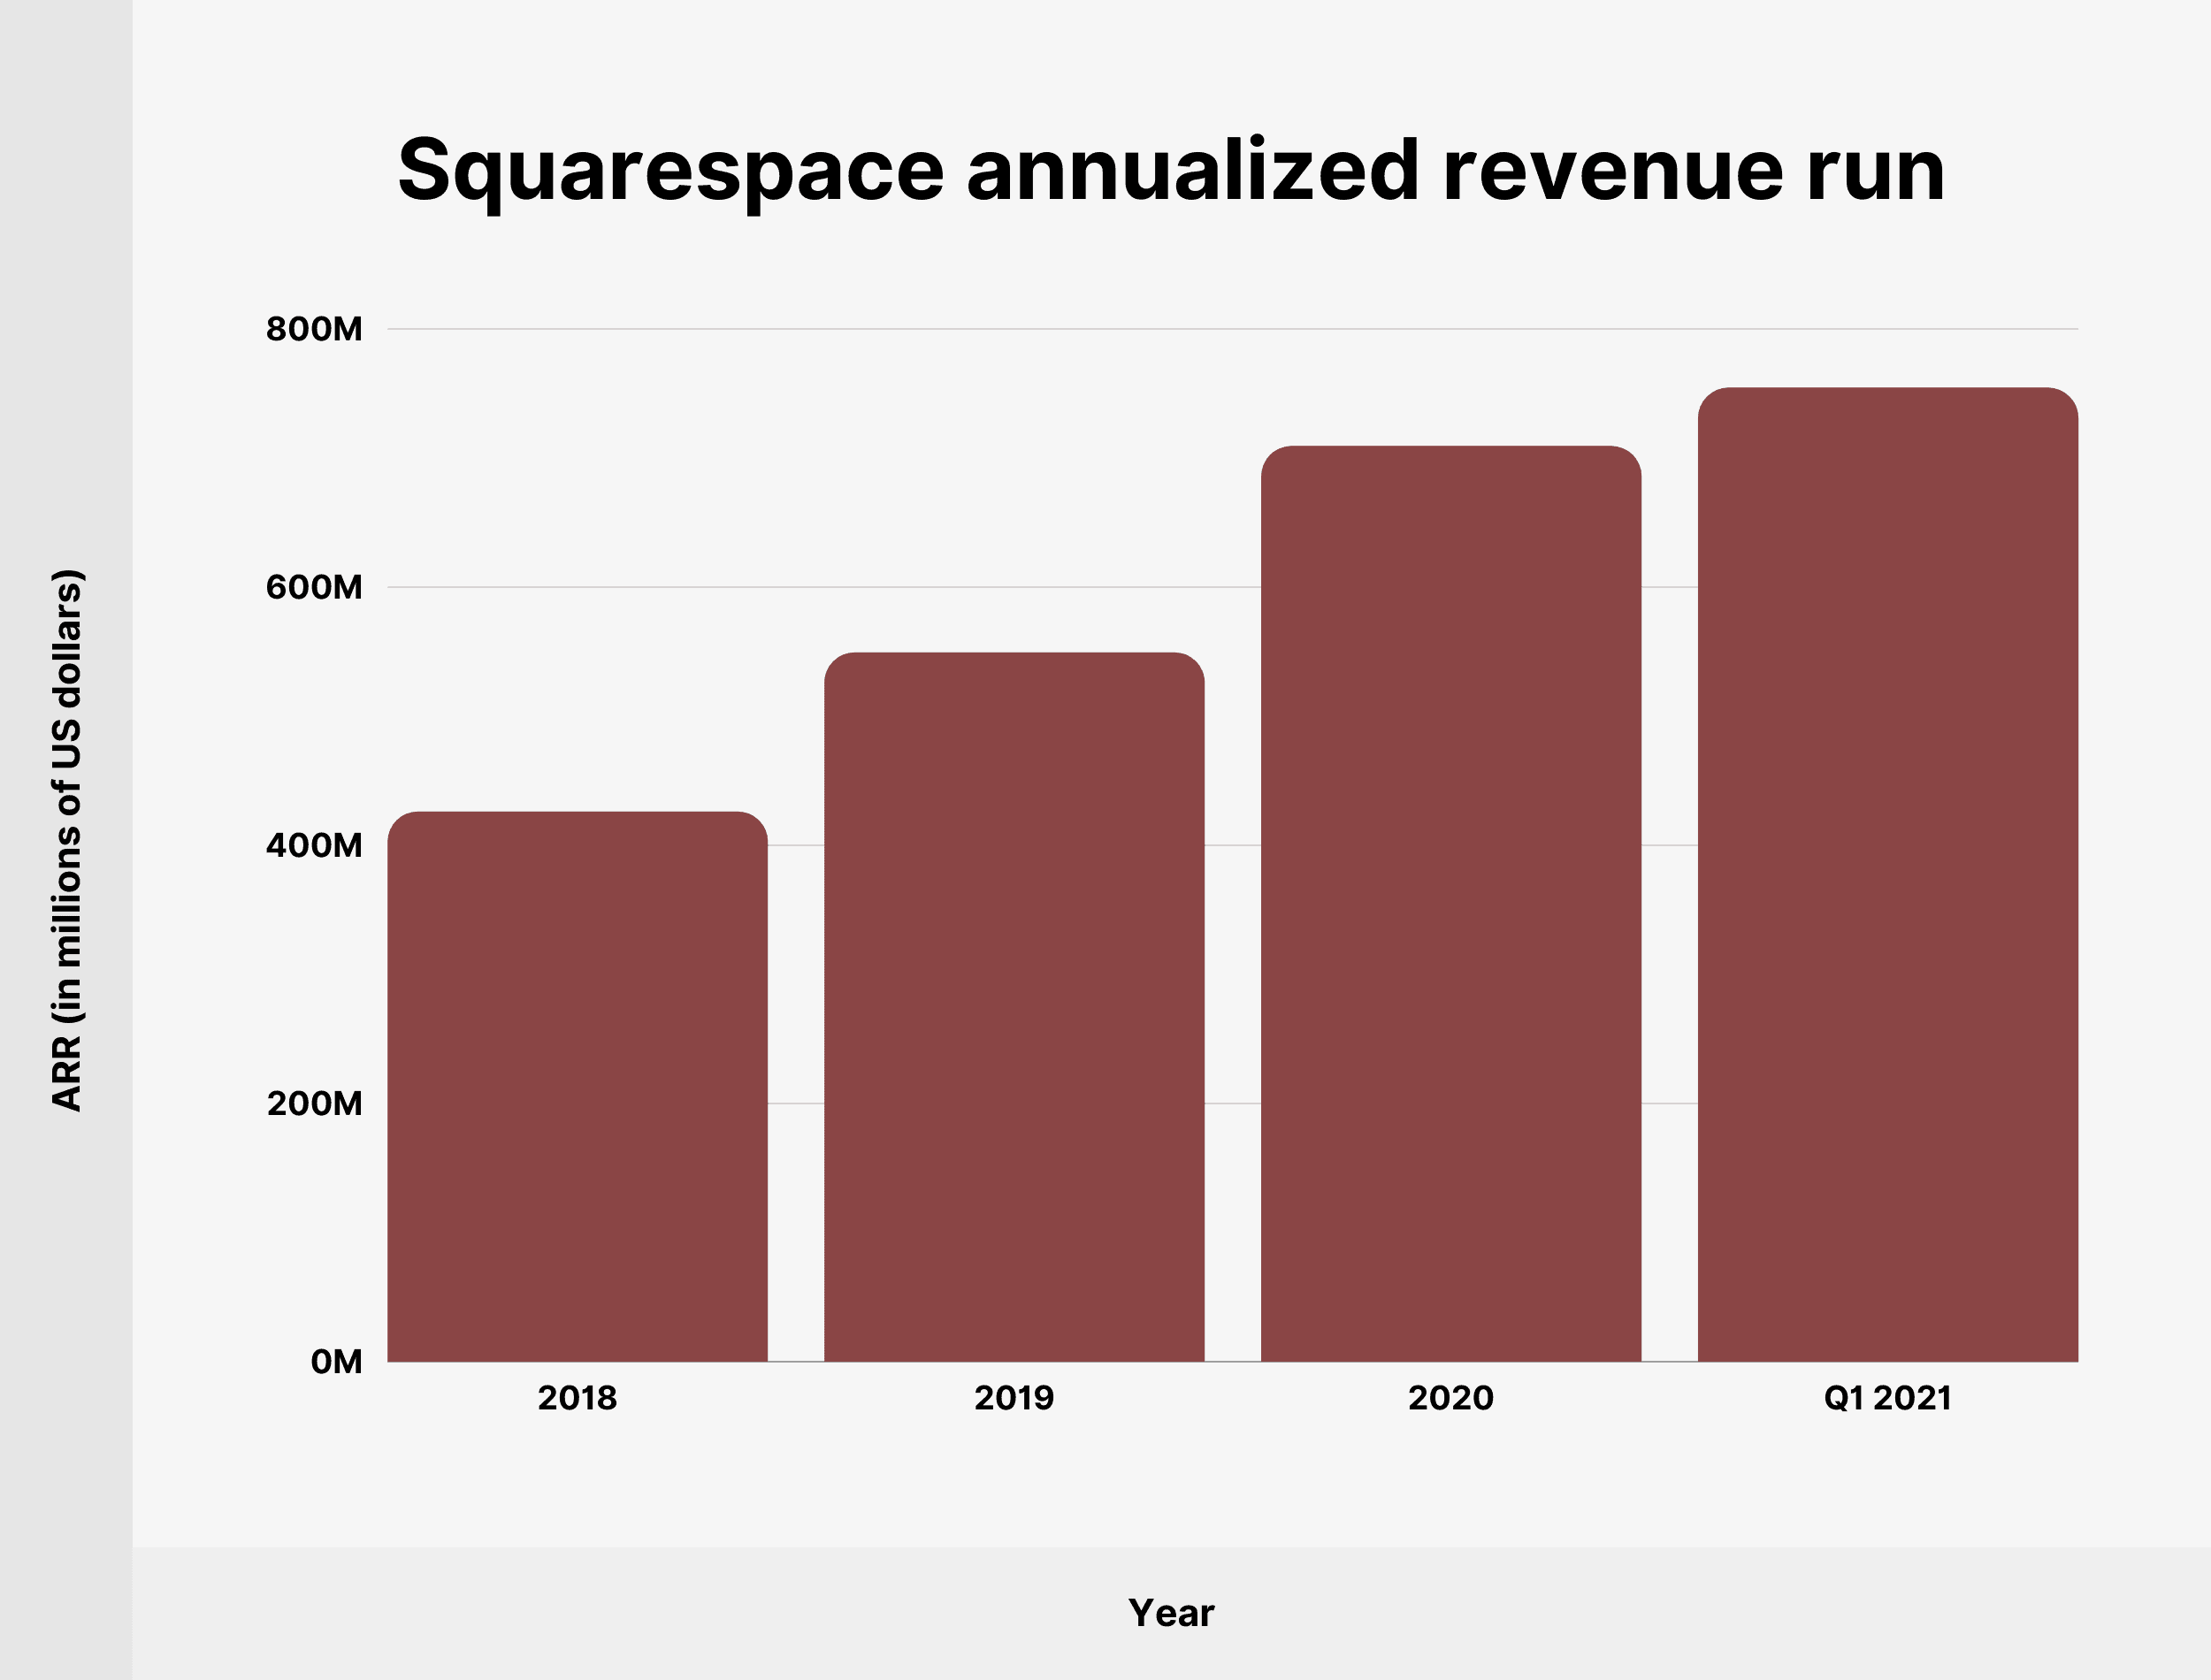 Squarespace annualized revenue run